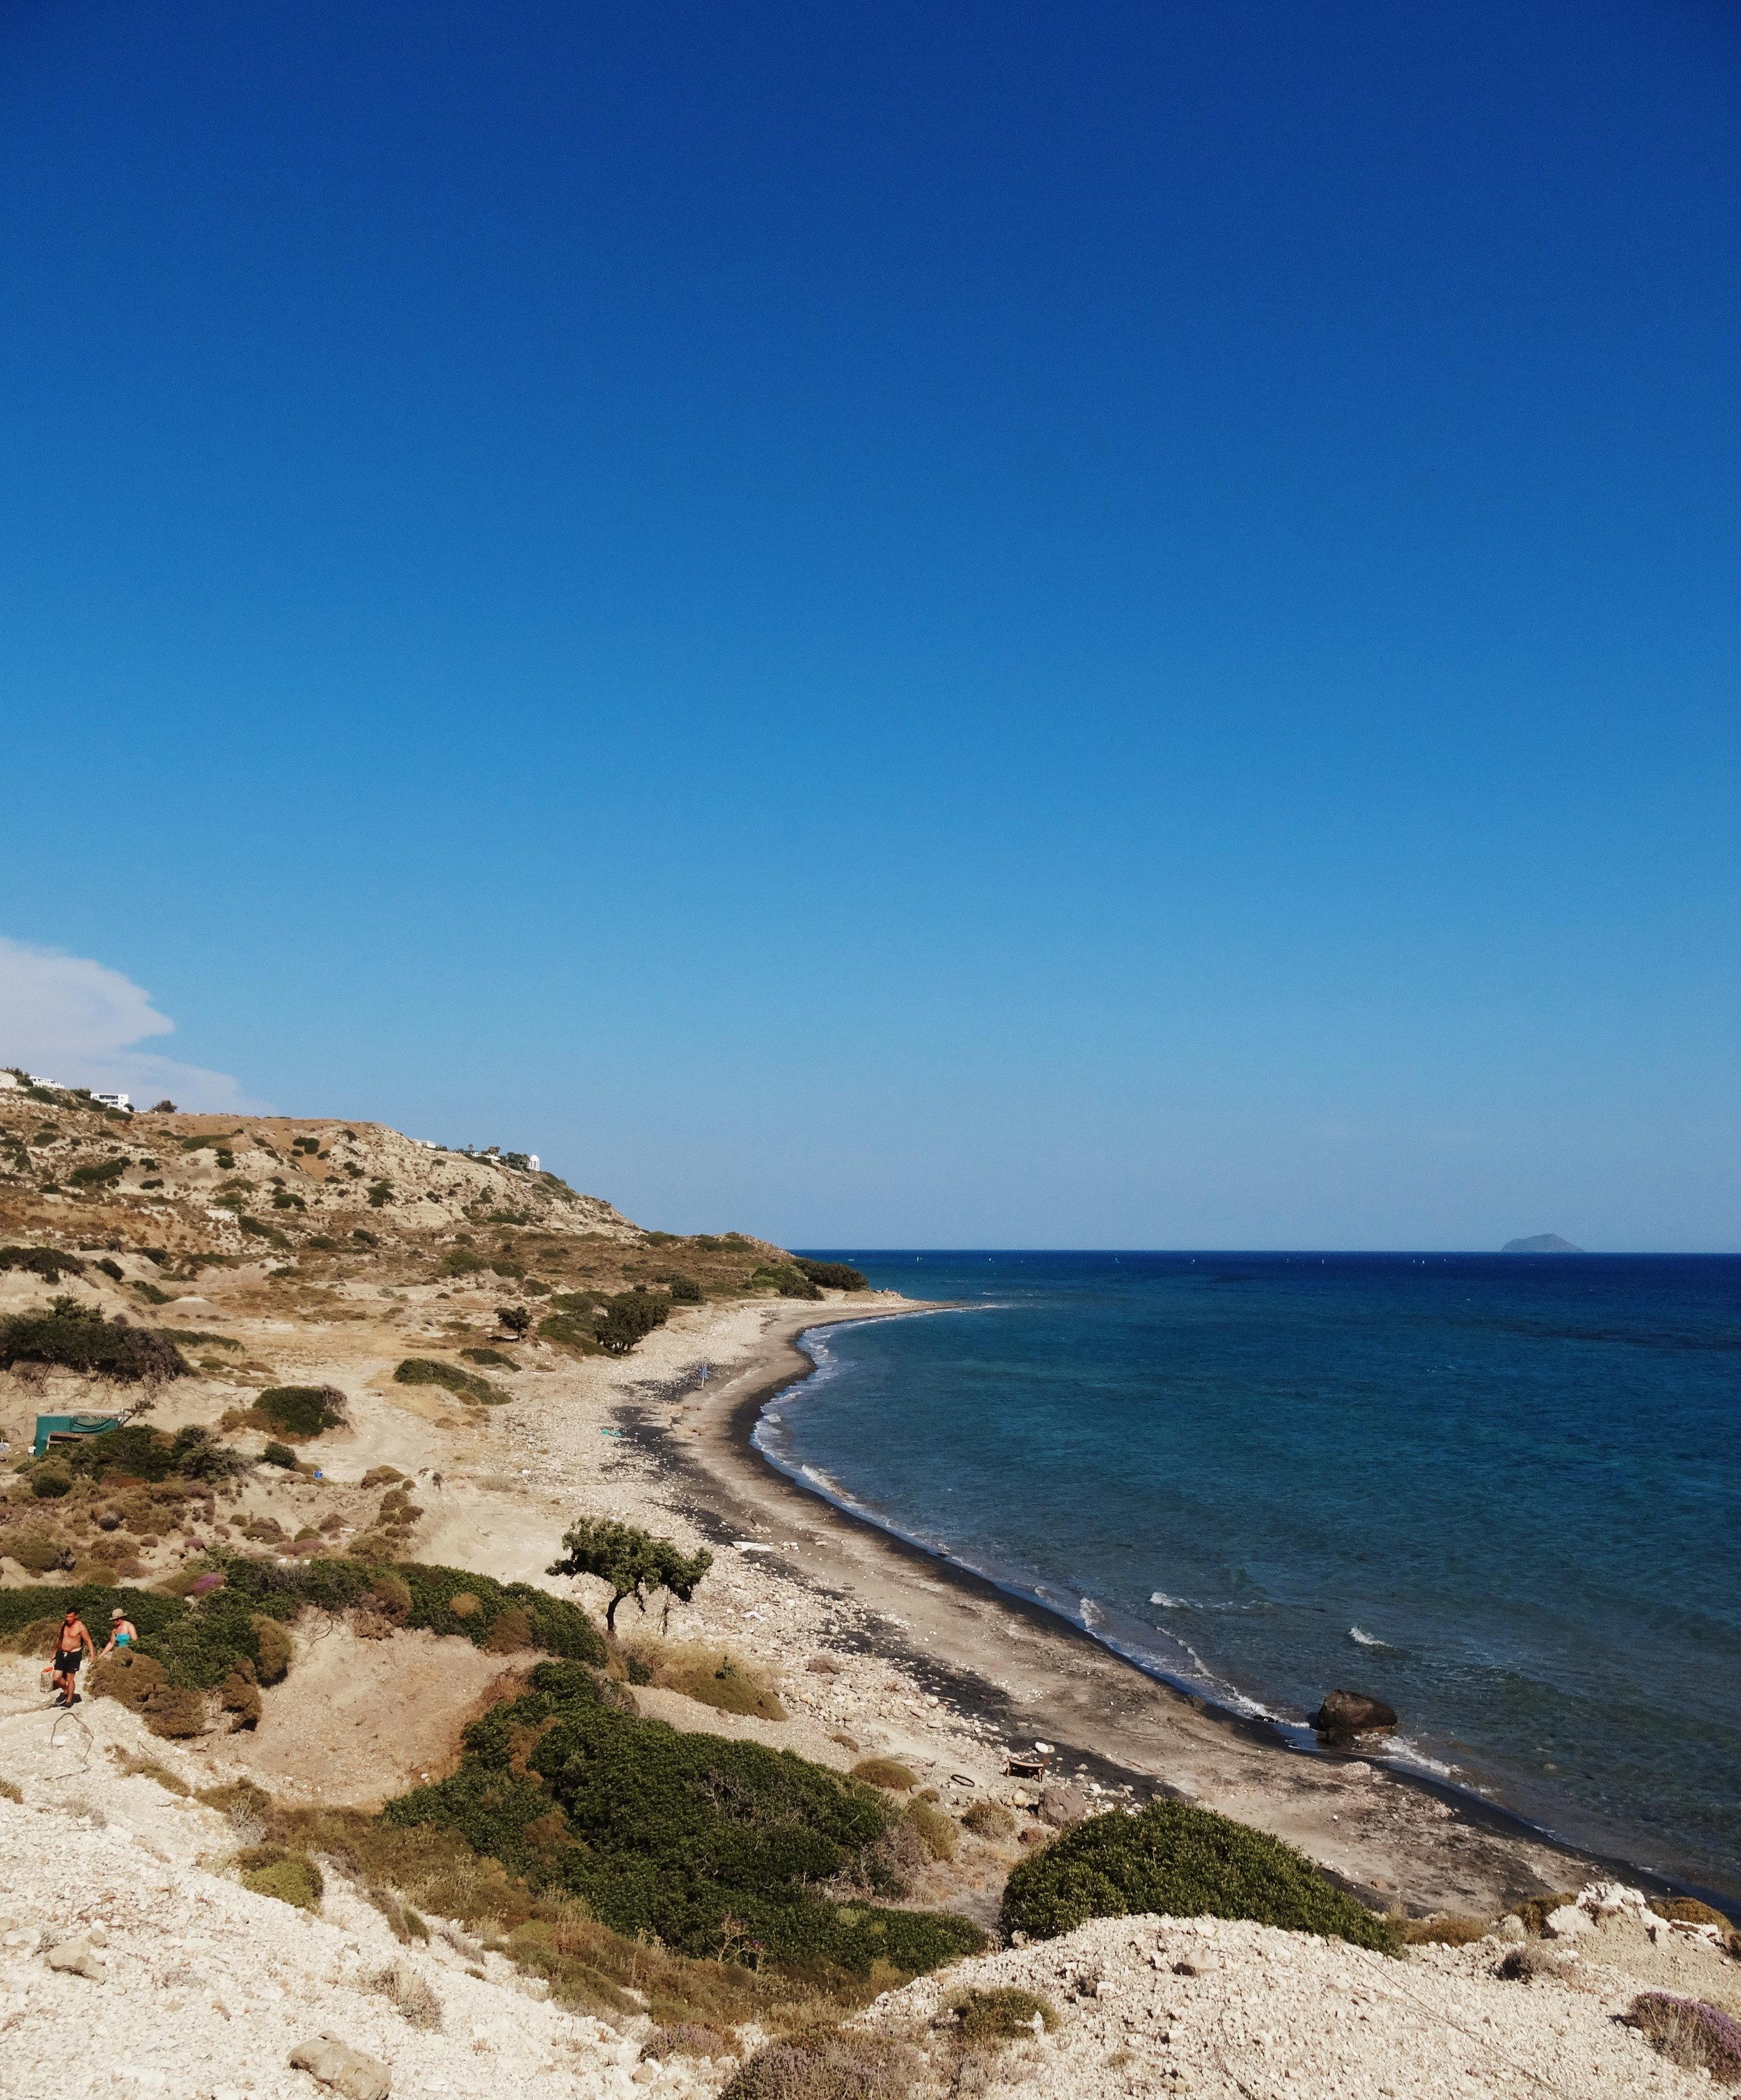 kokemuksia-kos-kreikka-helona-ranta-mona-kajander-matkablogi